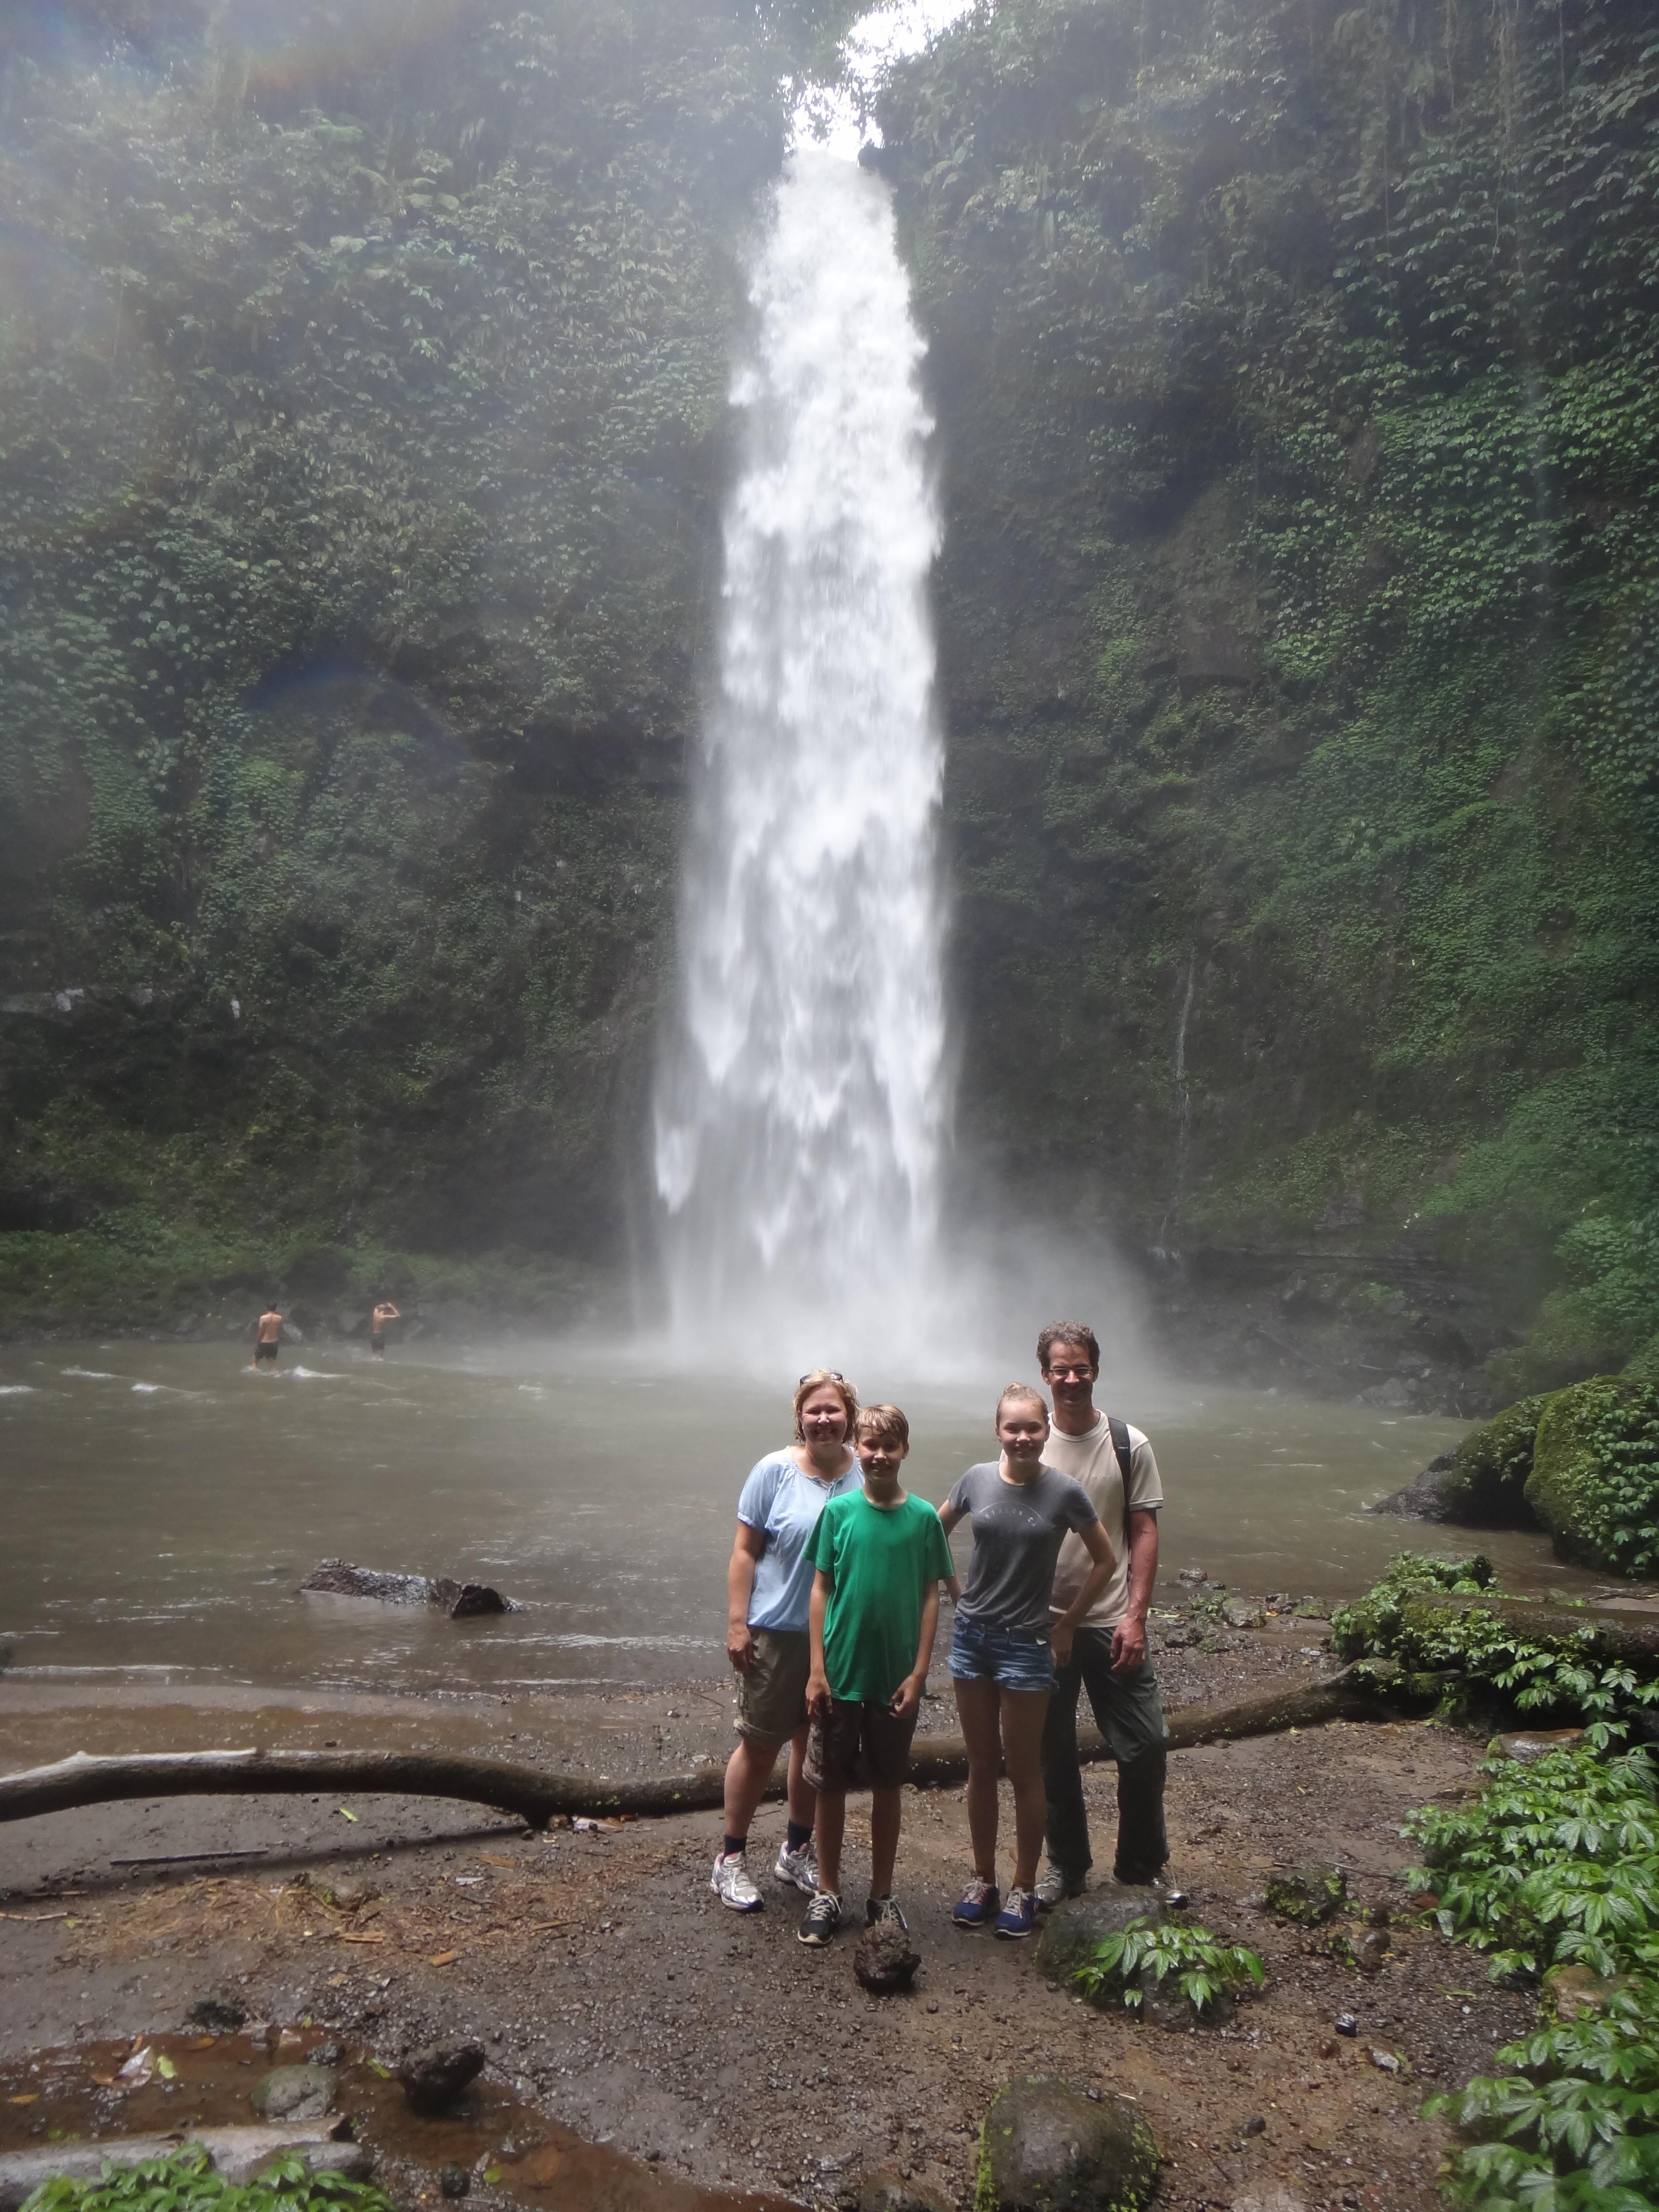 jungle waterfall trek - Jungle Waterfall Tour Packages, YOEXPLORE